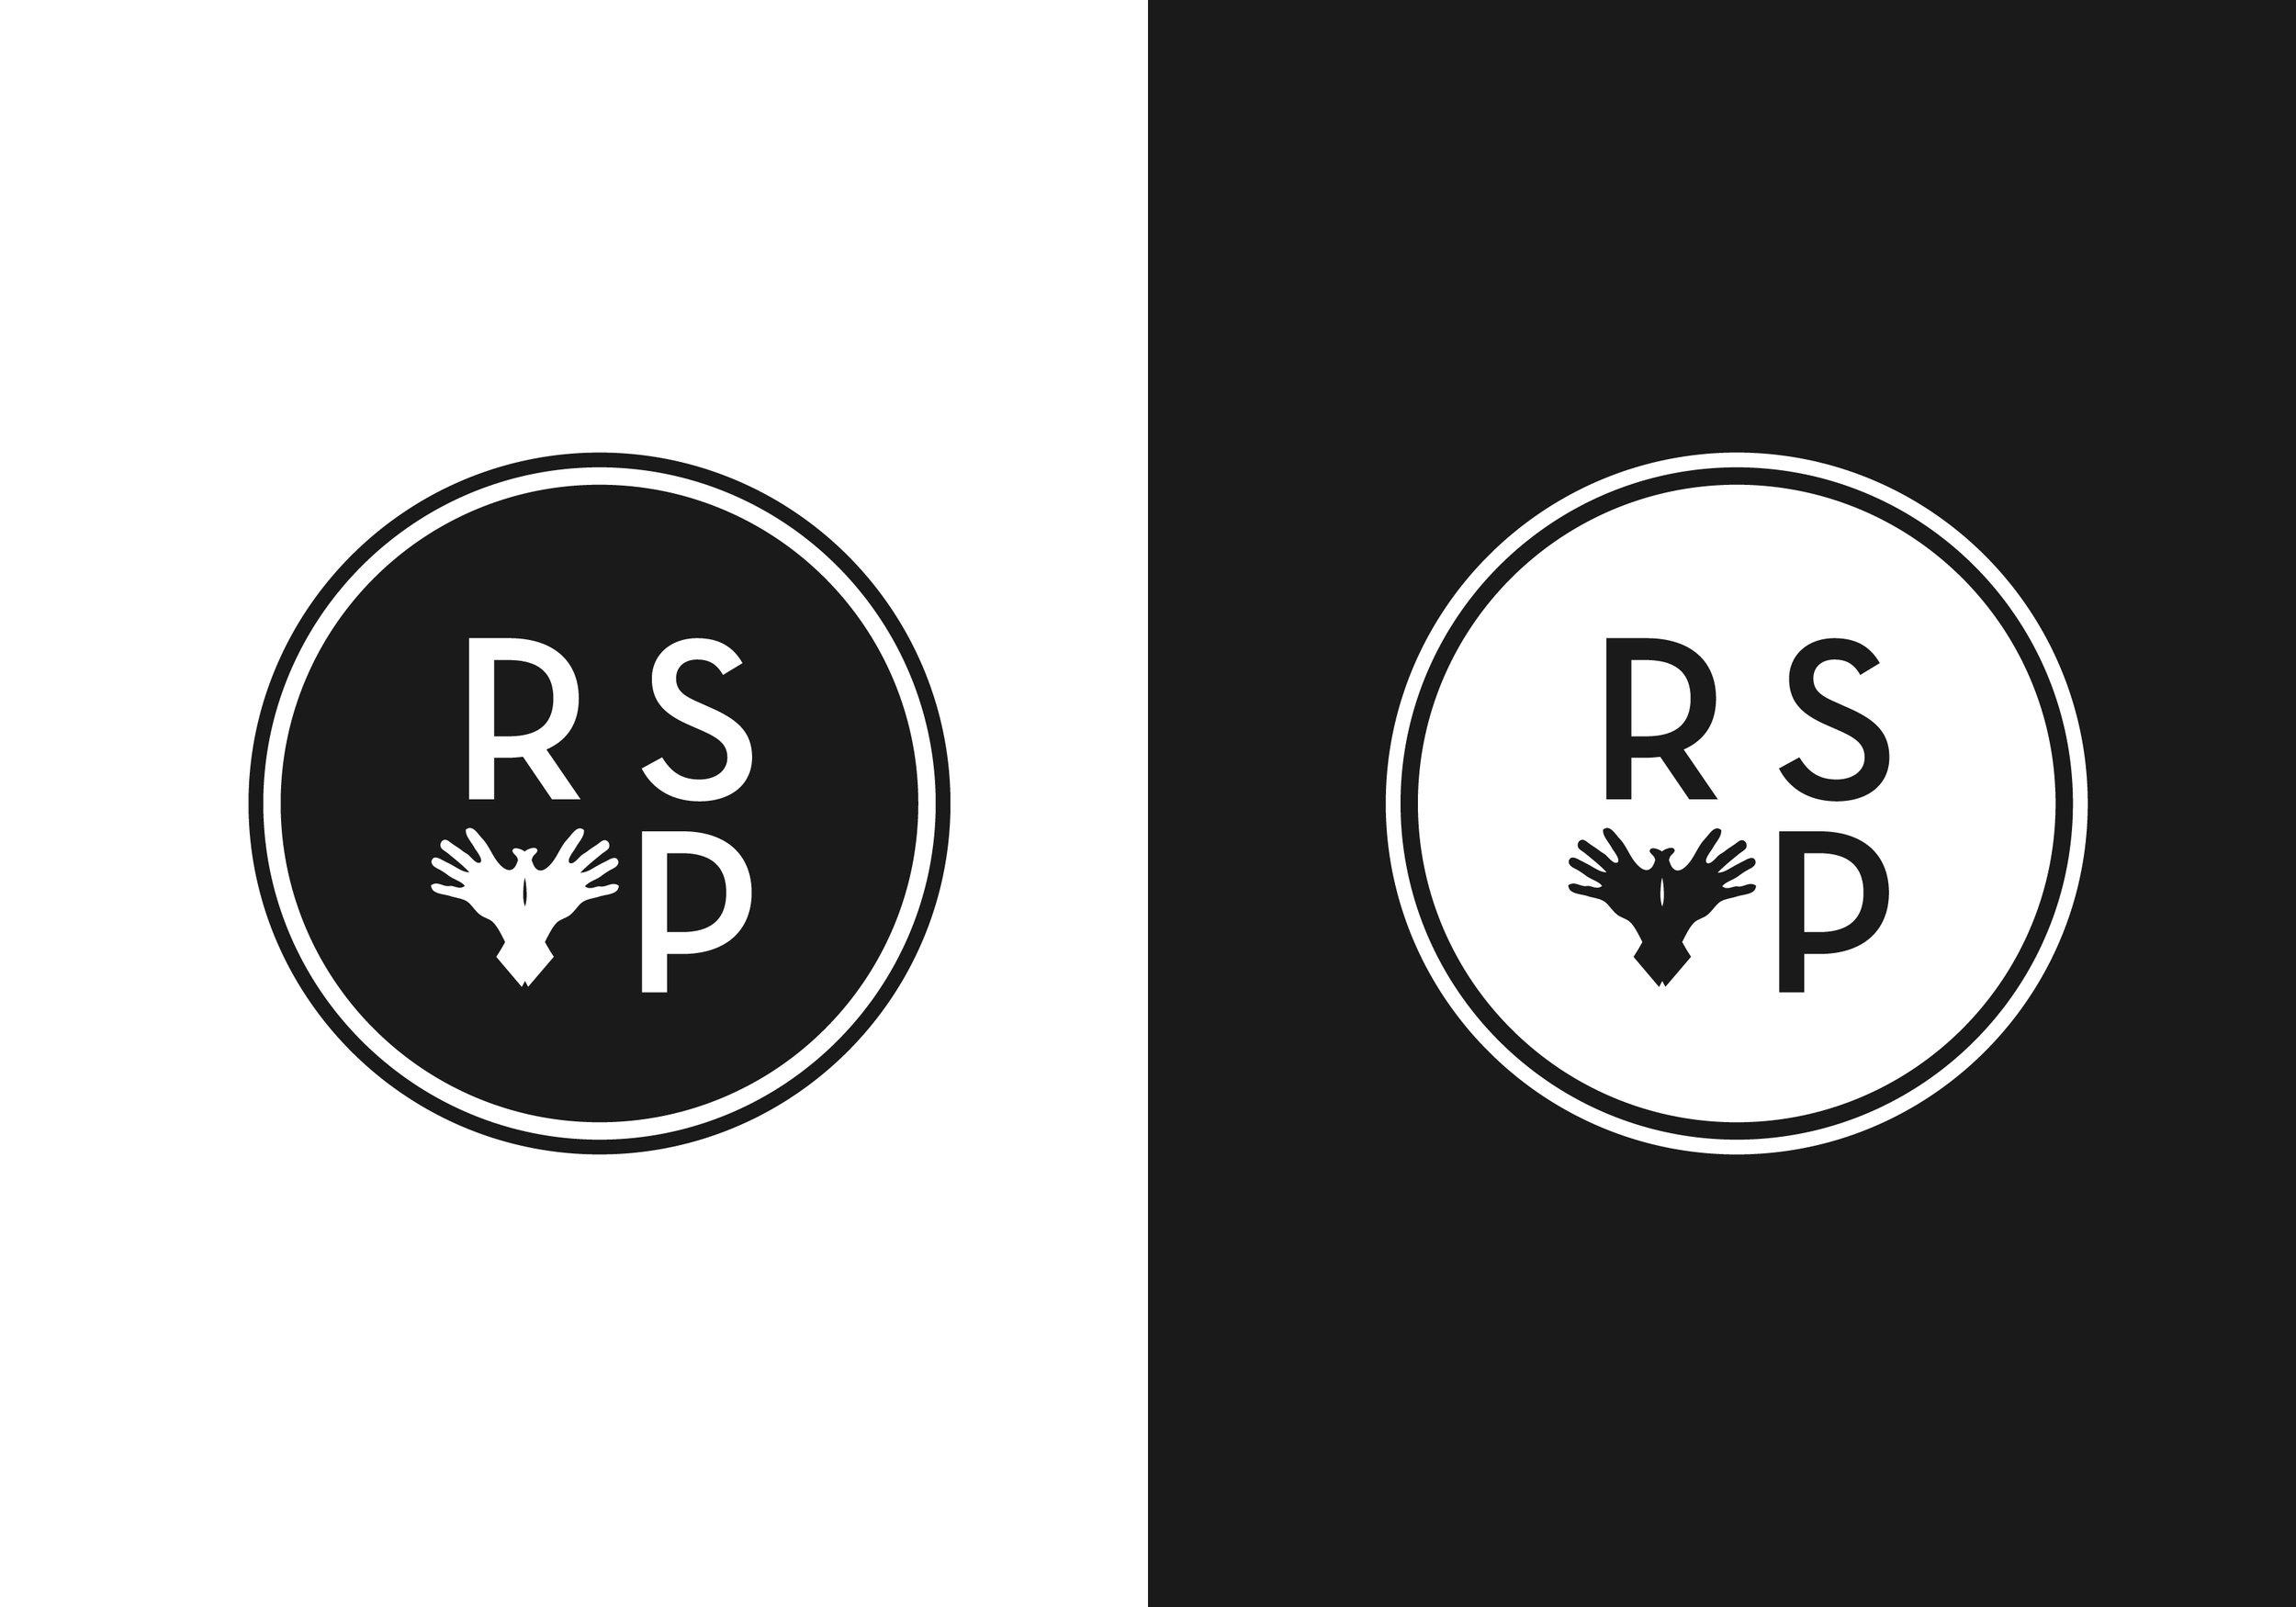 (2/5) Rice University Student Organization - Brand Design